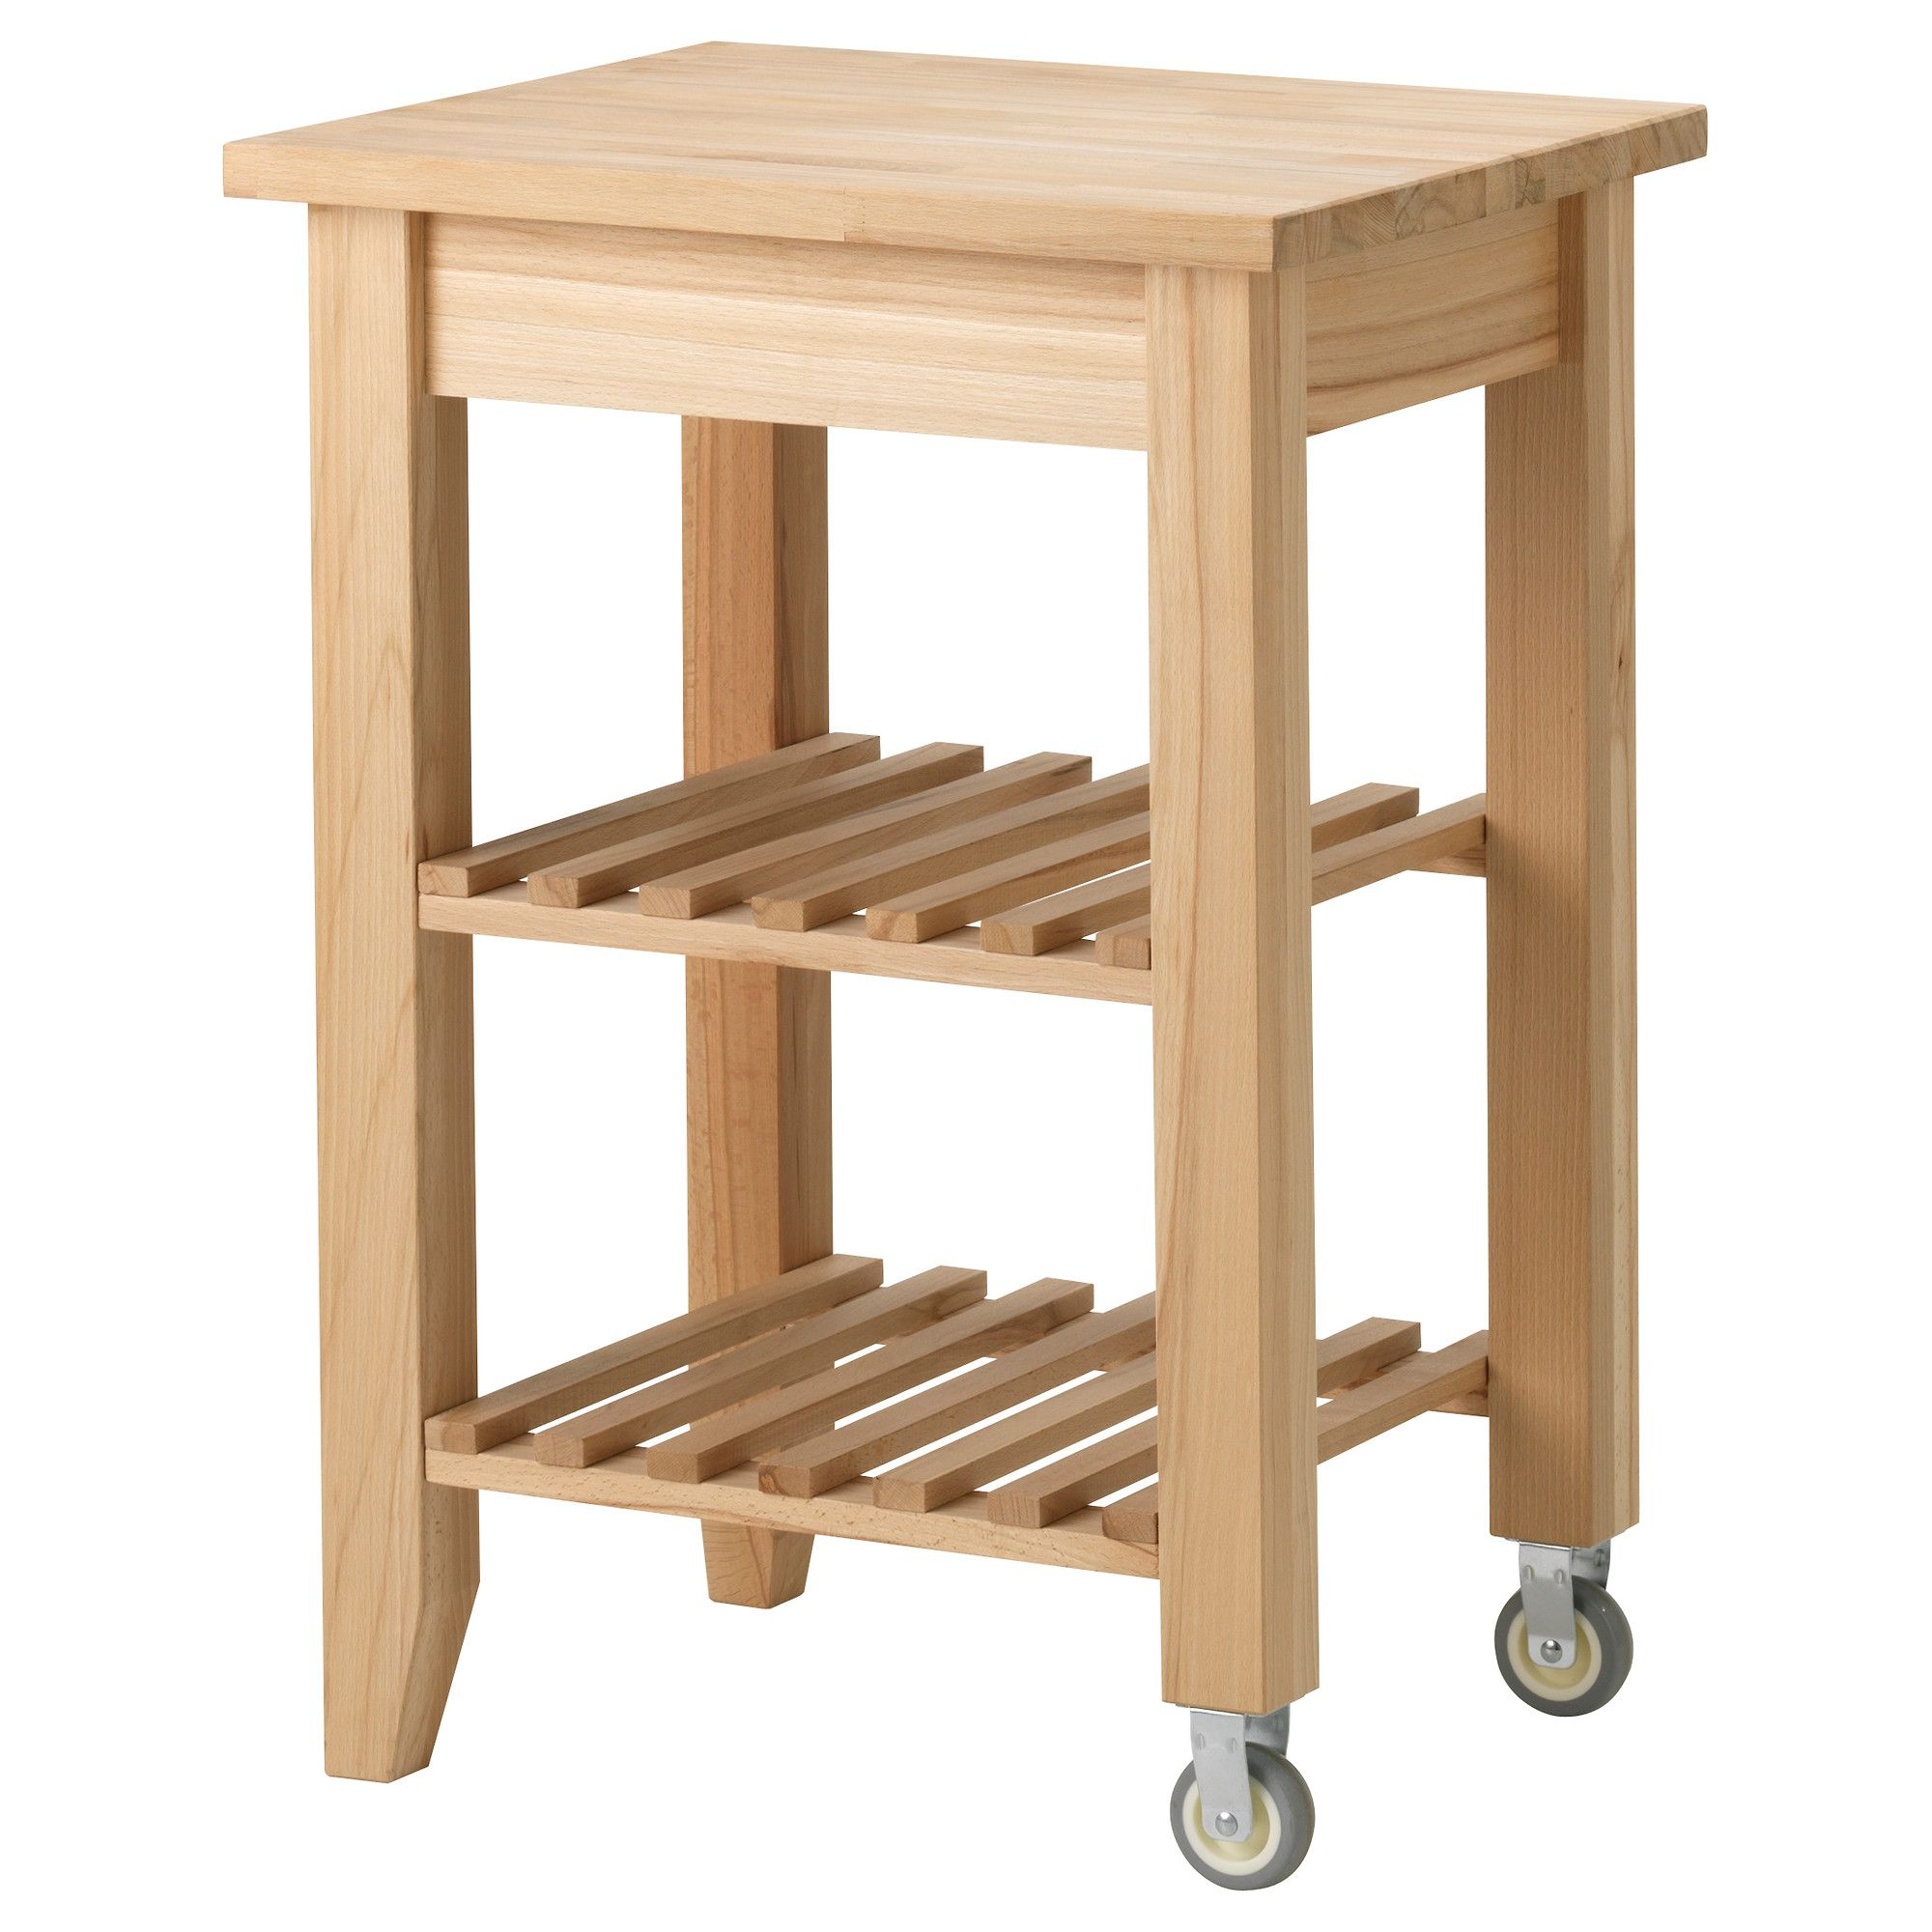 bekv m servierwagen buche ikea list ikea bekvam ikea trolley und ikea solid wood. Black Bedroom Furniture Sets. Home Design Ideas